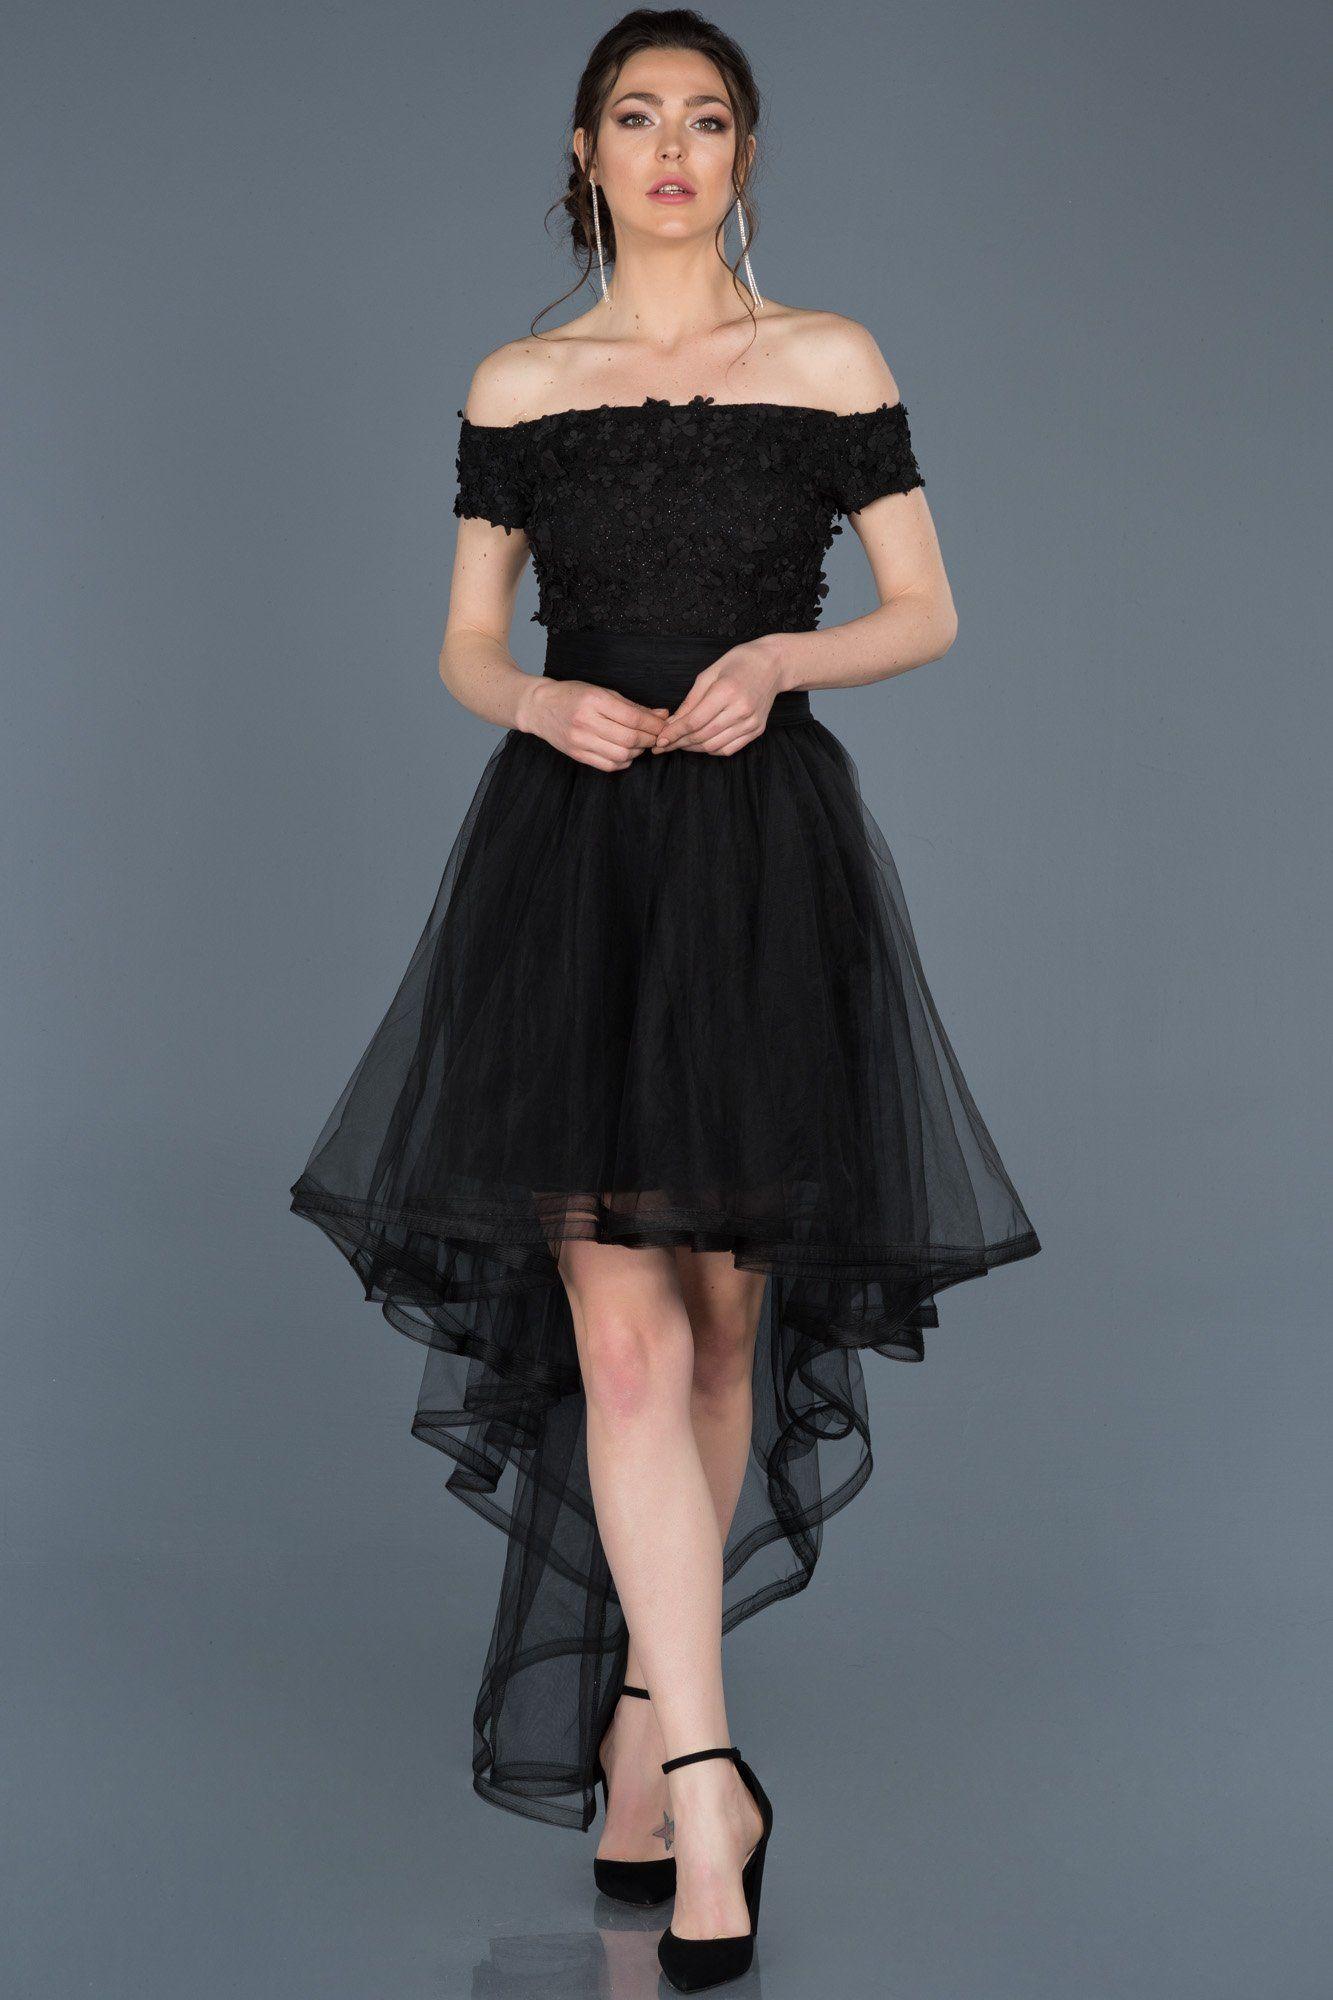 Onu Kisa Arkasi Uzun Siyah Mezuniyet Elbisesi Abo022 Elbiseler Siyah Kisa Elbise Elbise